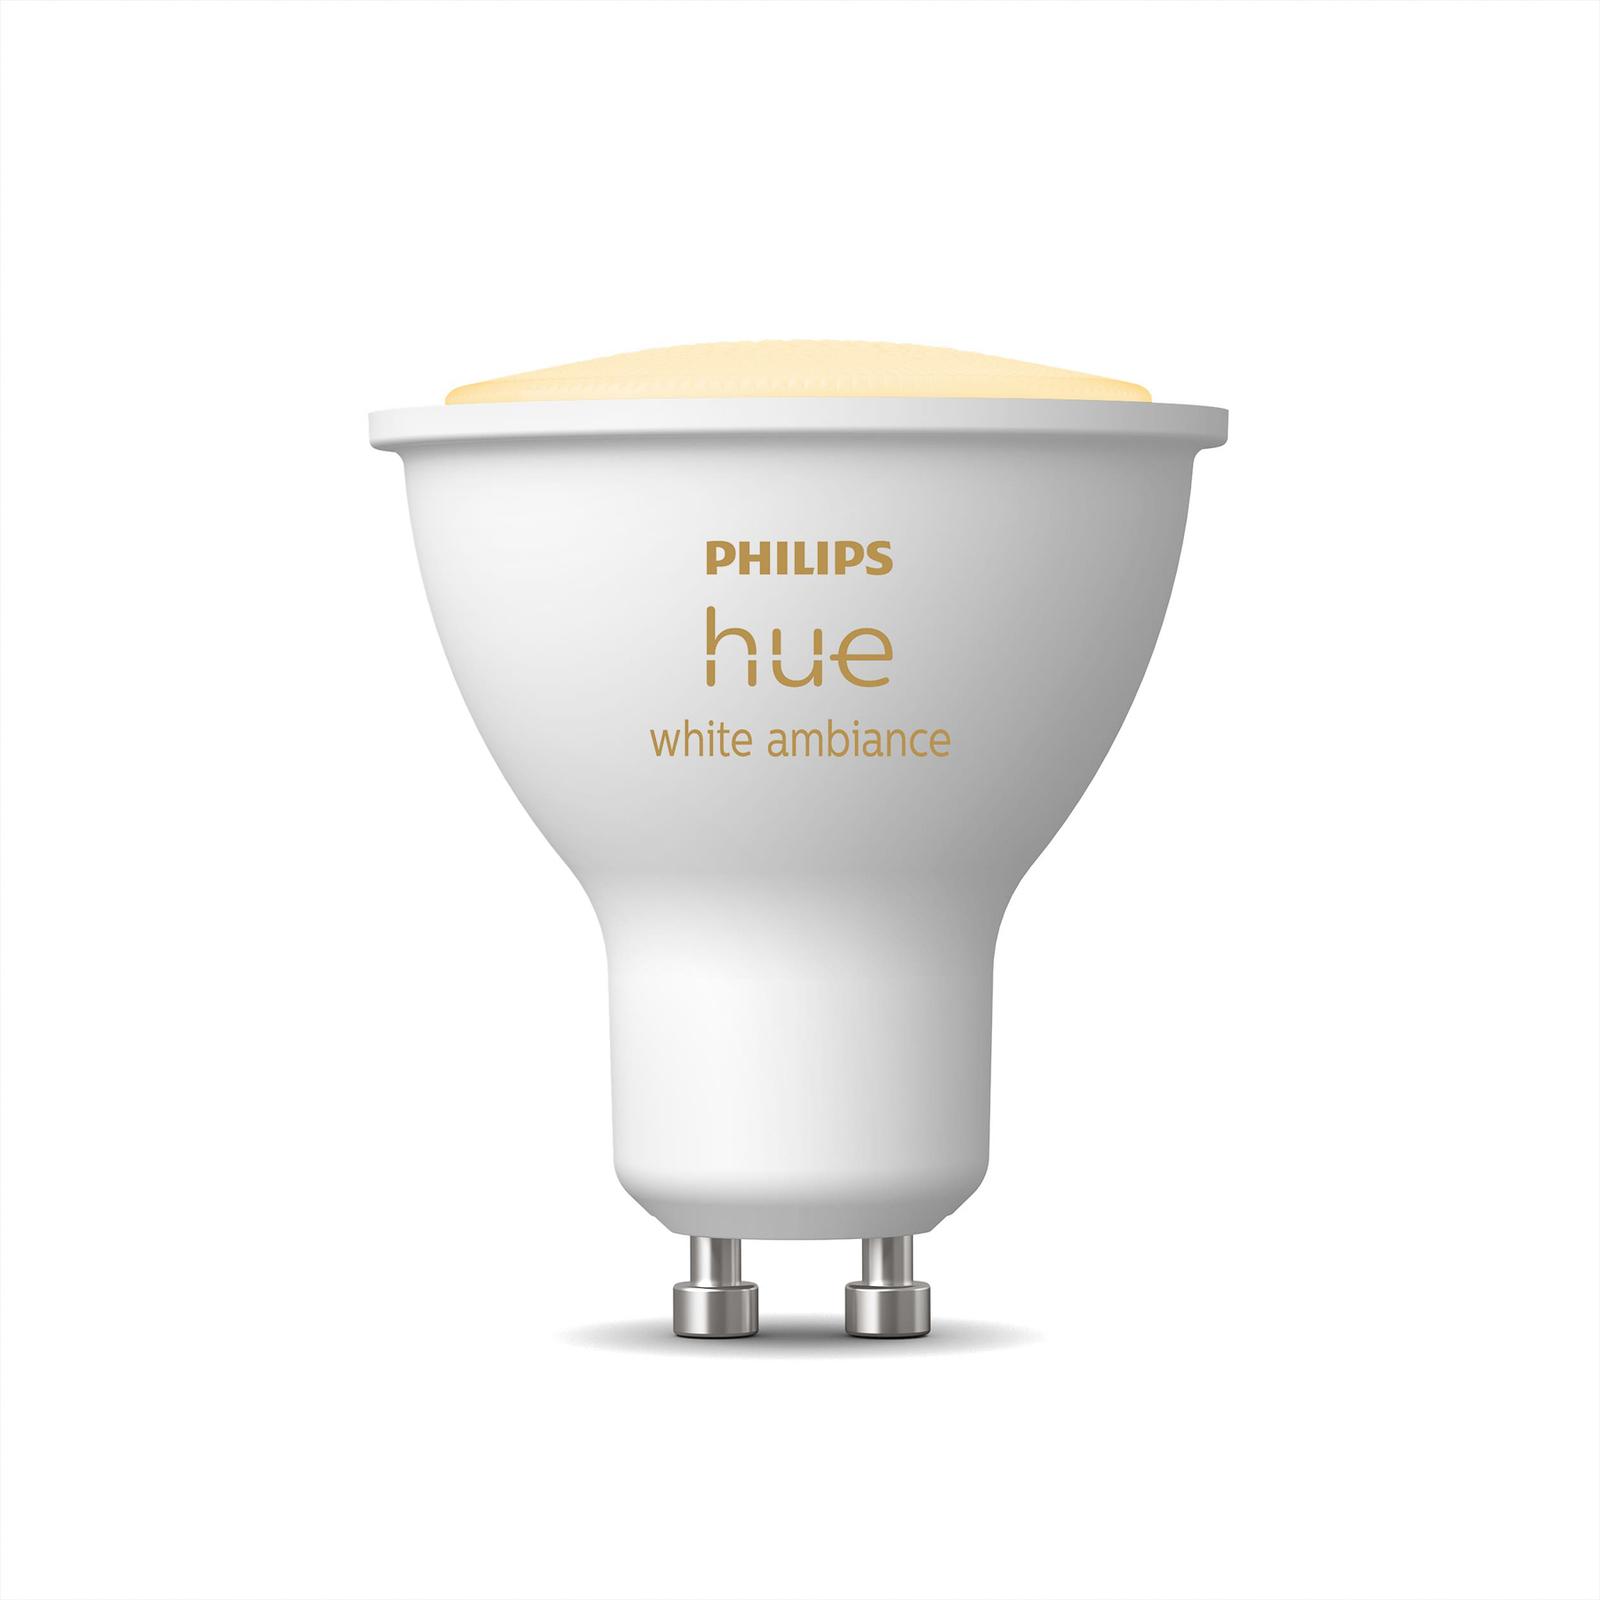 Philips Hue White Ambiance 4,3 W GU10 LED-pære